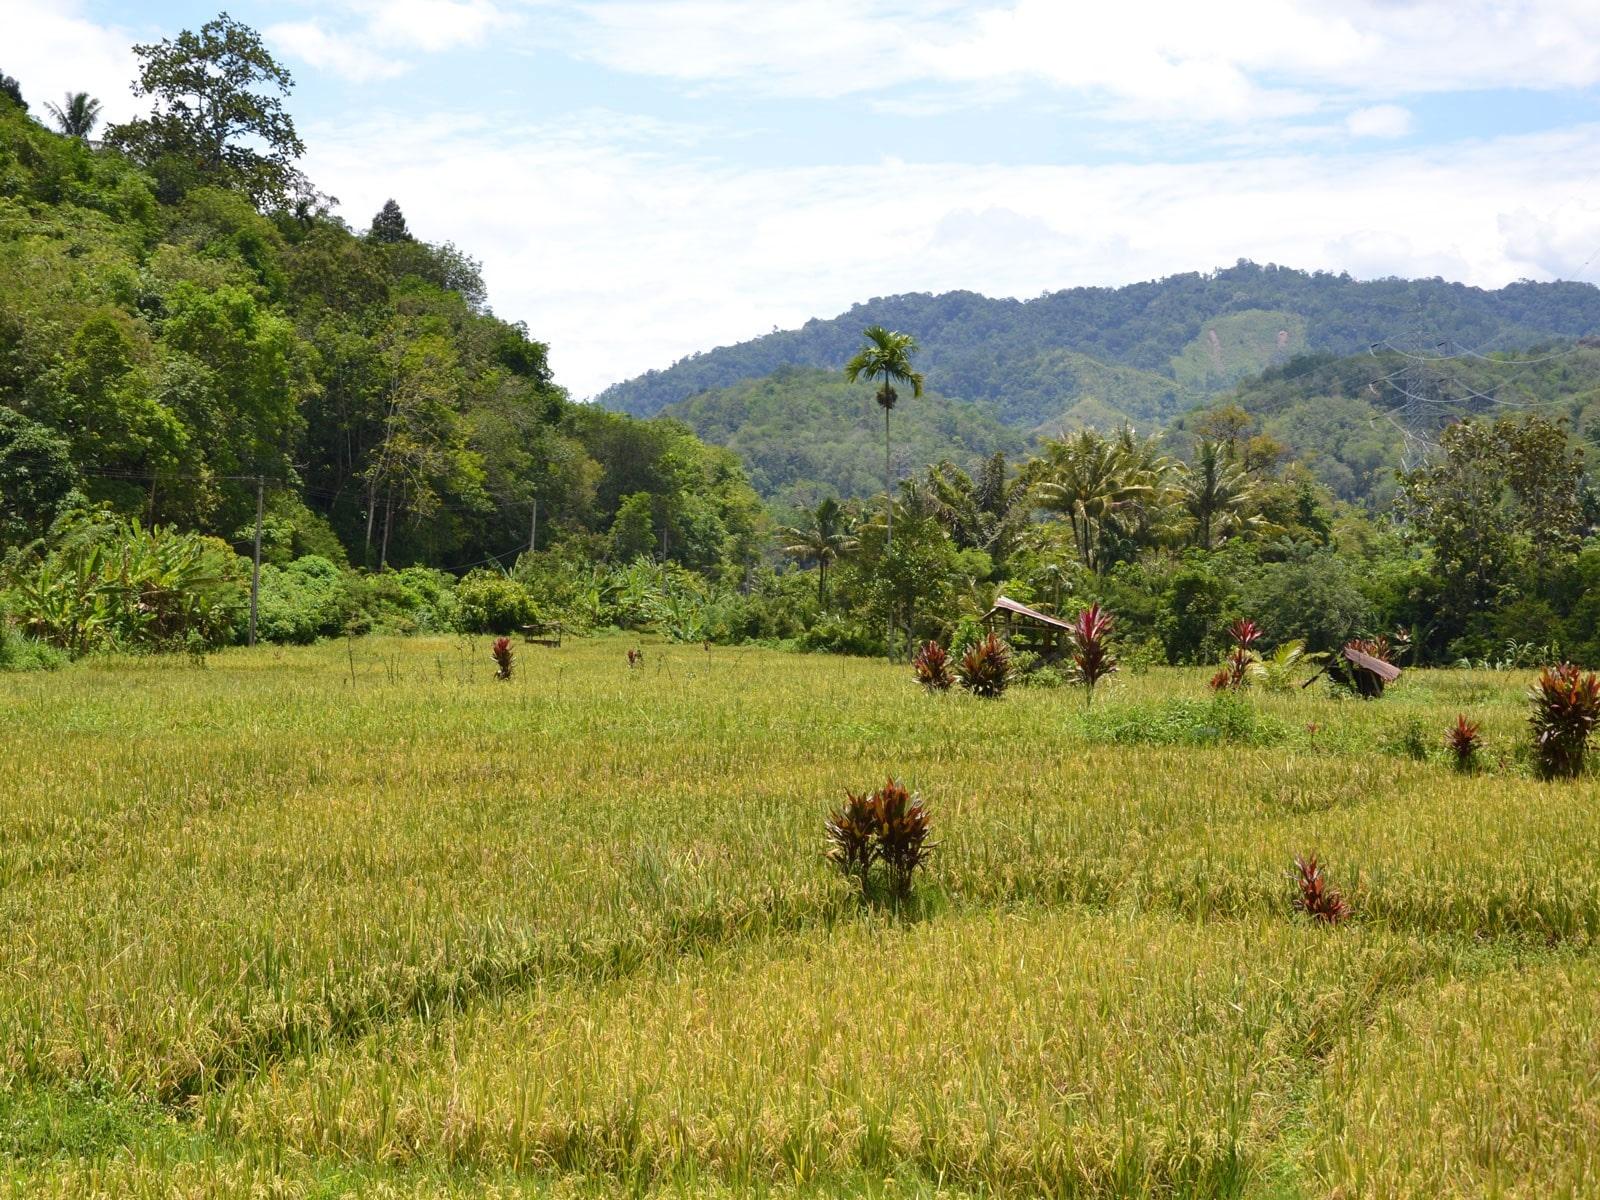 rondreis sumatra sipirok hoogtepunt 13